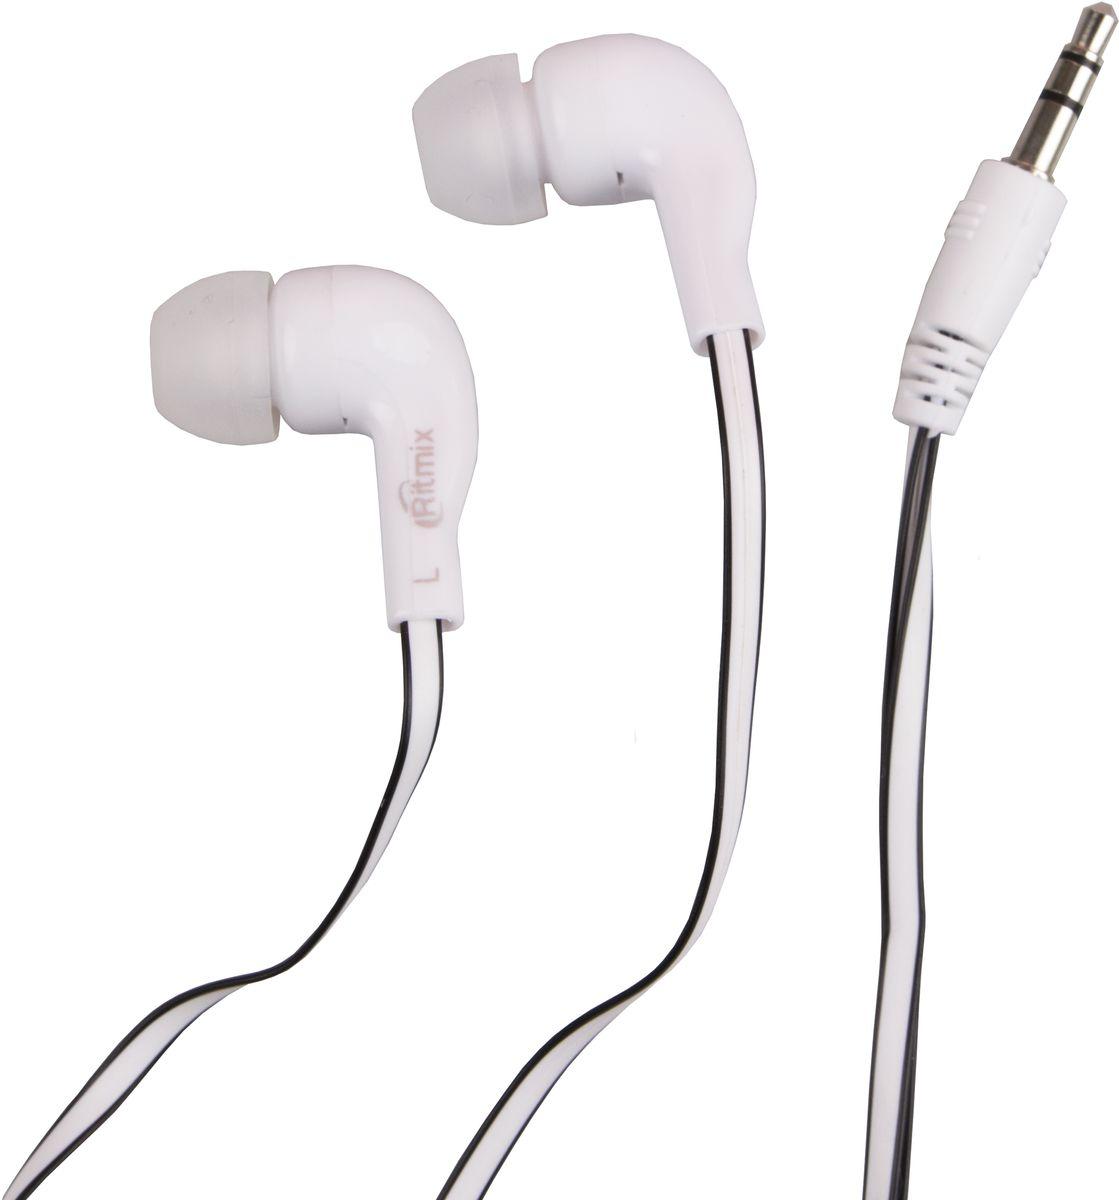 Ritmix RH-004, White наушники аудио наушники ritmix гарнитуры ritmix rh 565m gaming